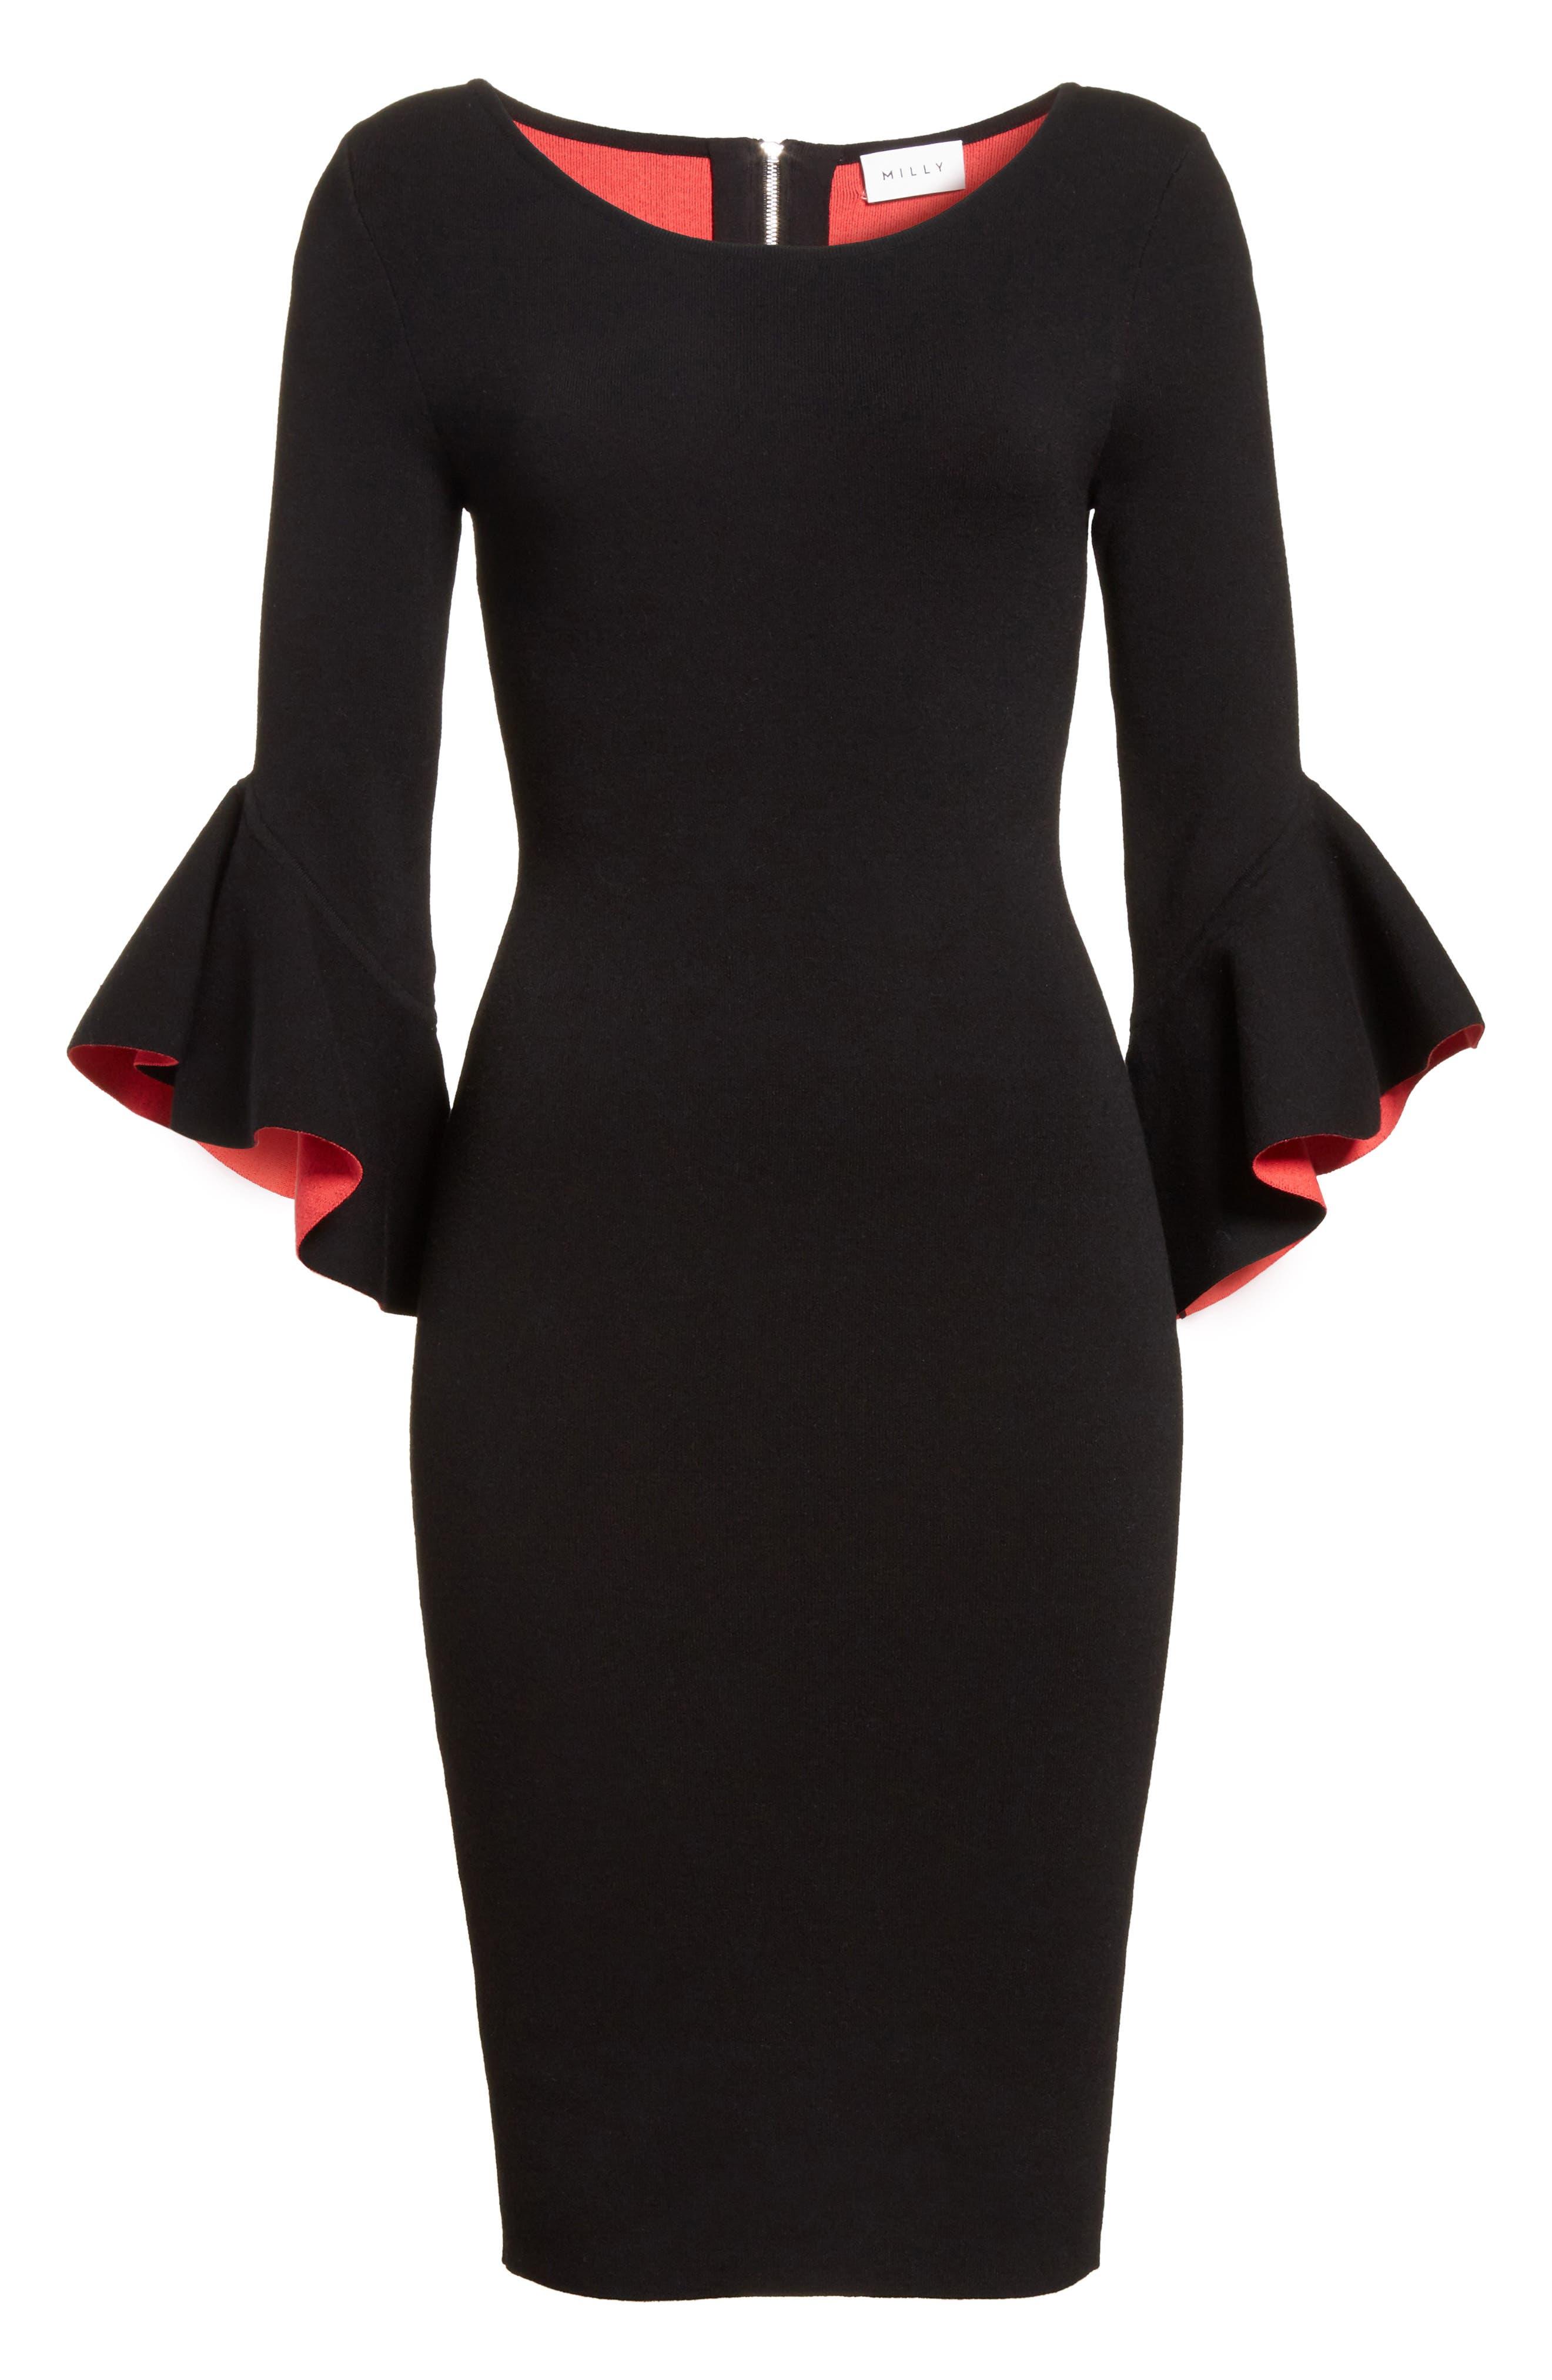 Contrast Lined Bell Sleeve Sheath Dress,                             Alternate thumbnail 6, color,                             Black/ Cherry